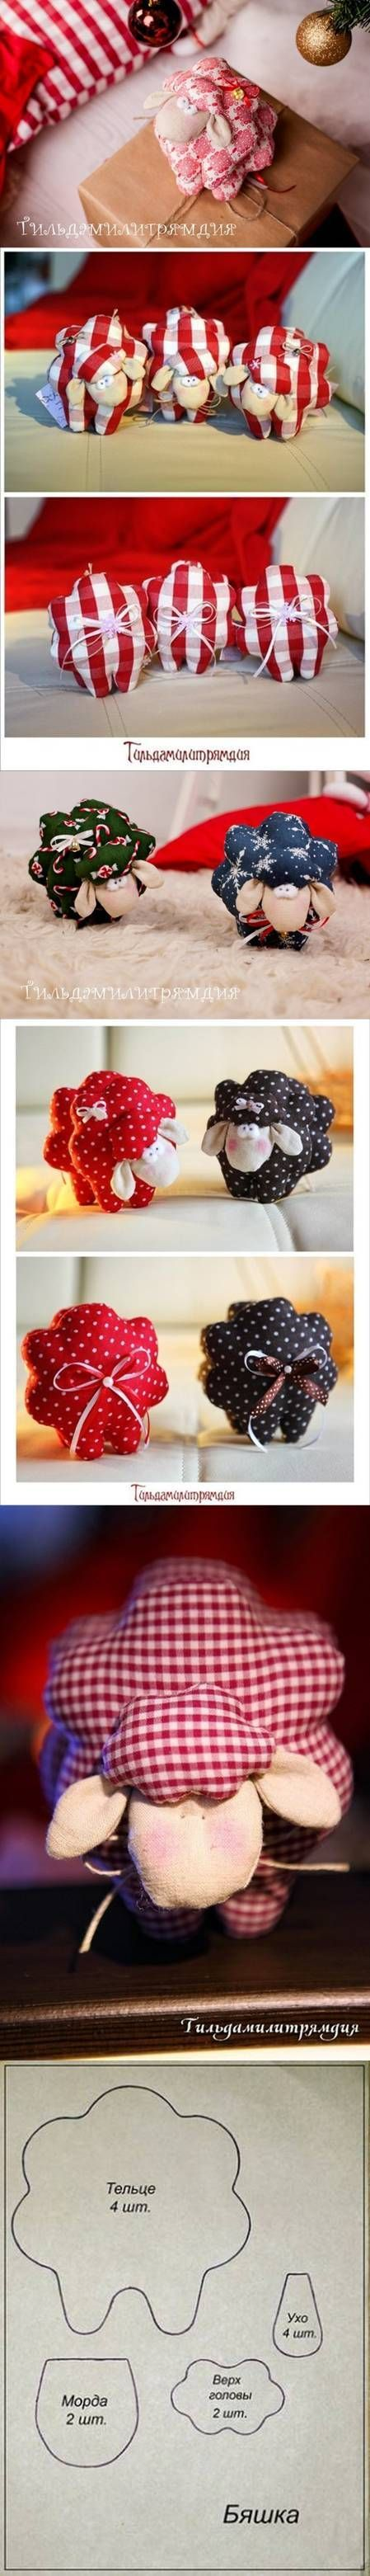 DIY Cute Fabric Lamb DIY Projects / UsefulDIY.com on imgfave